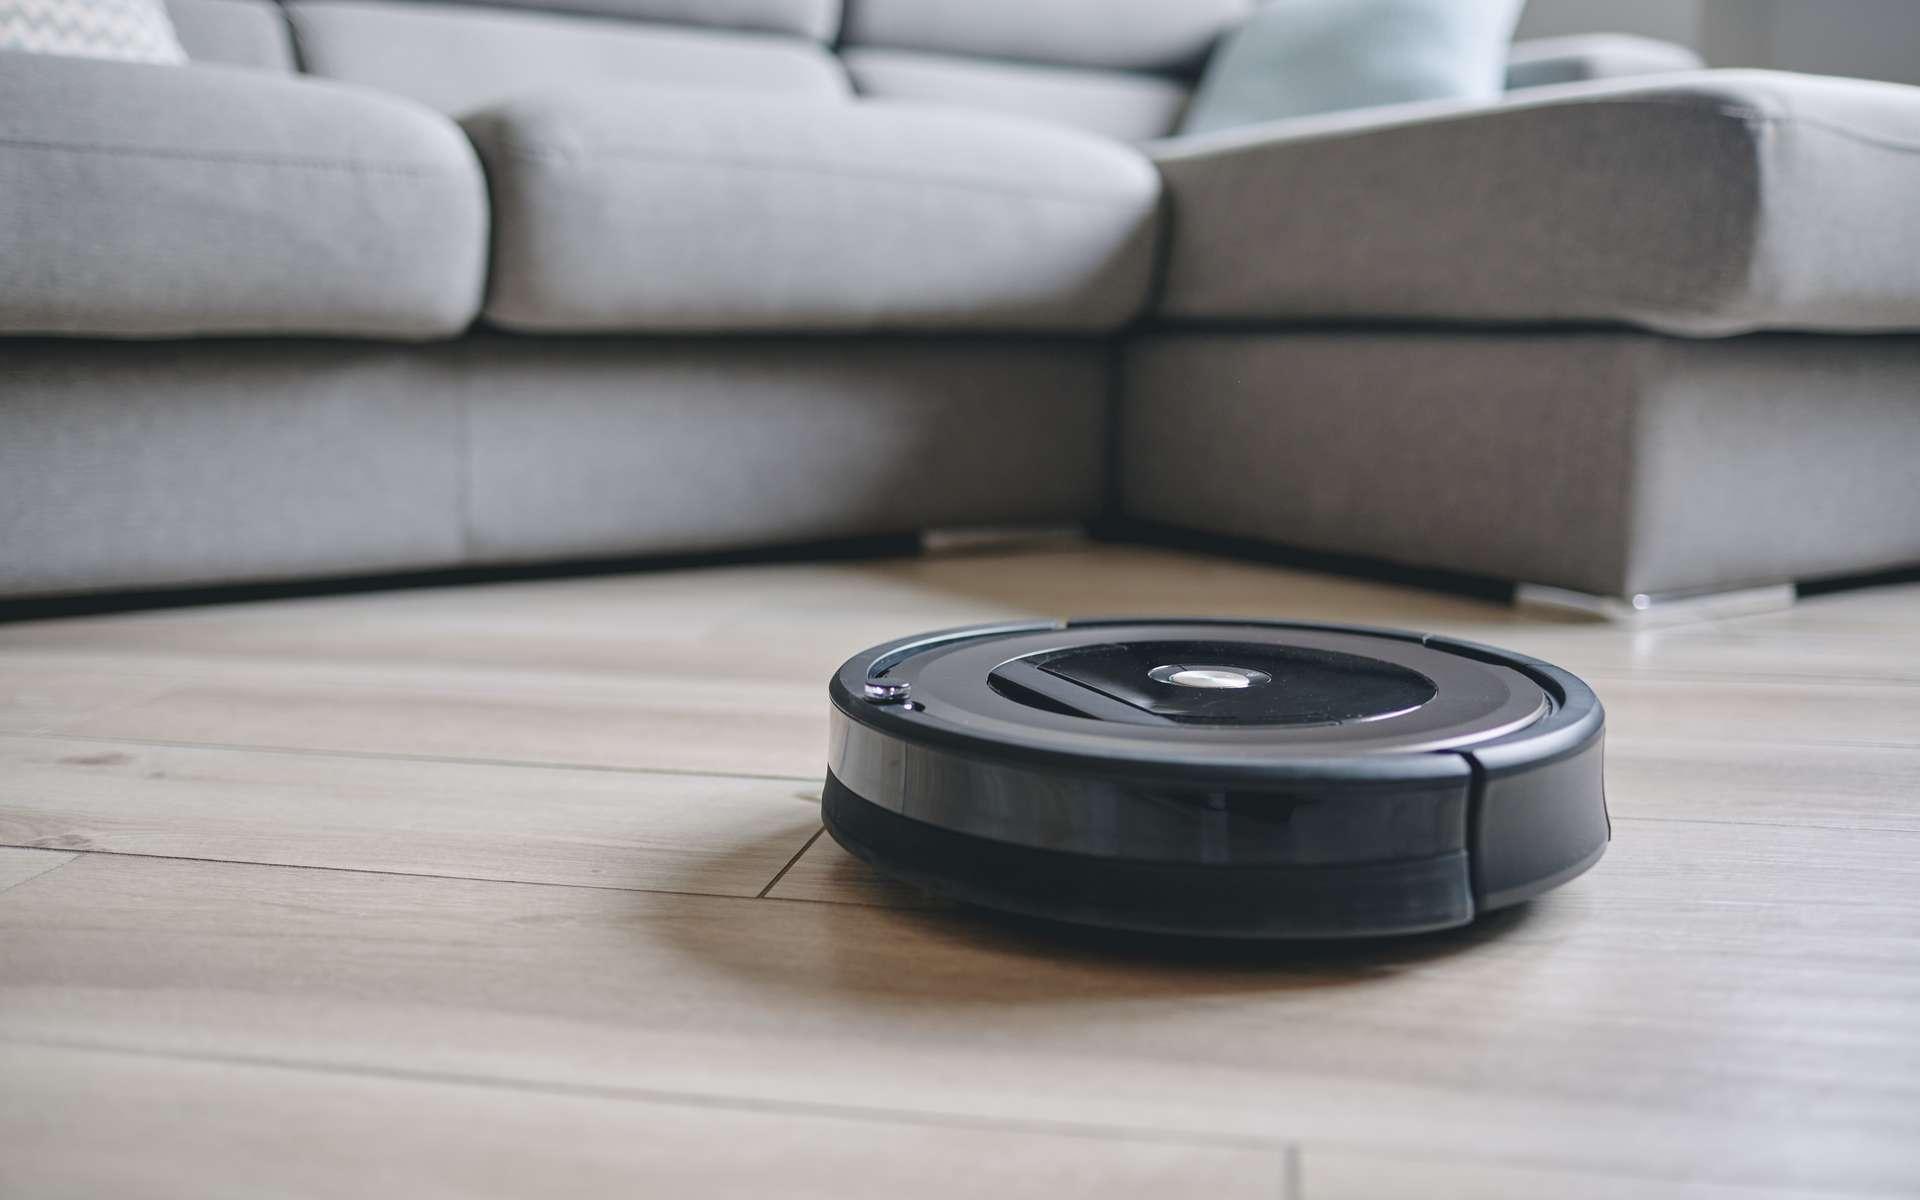 Aspirateur robot, l'aspiration intelligente. © matteozin, Adobe Stock